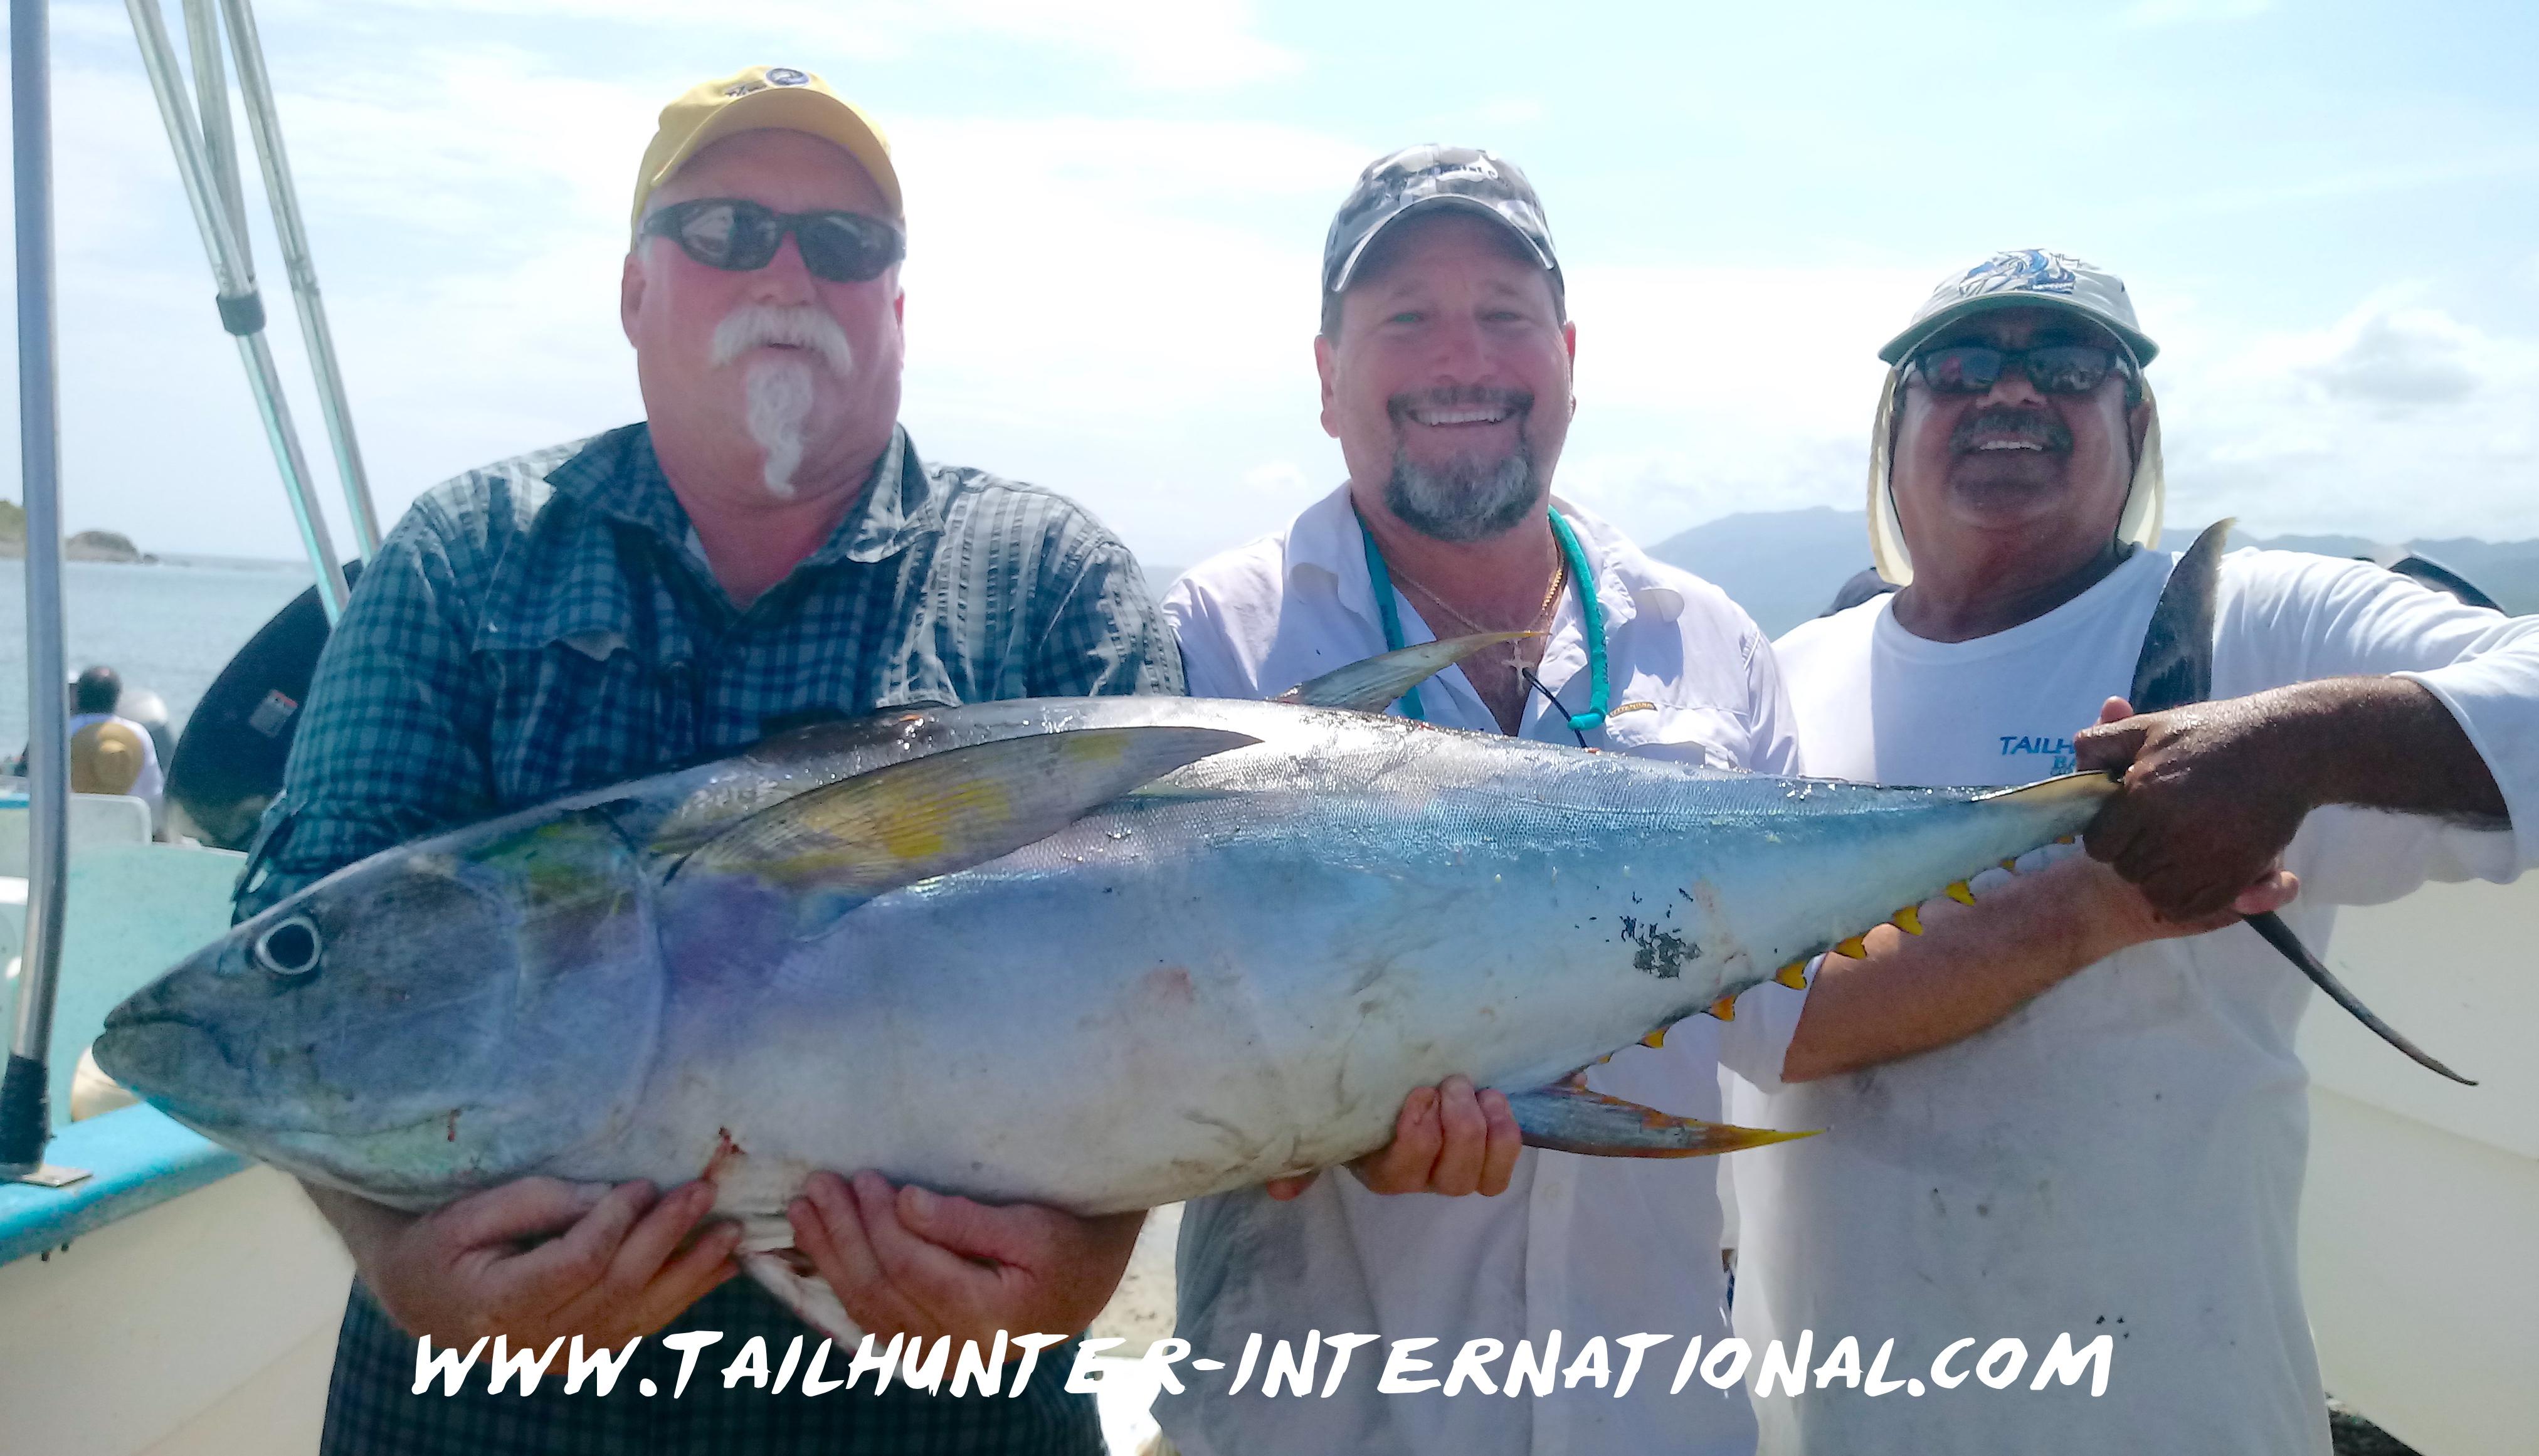 Tailhunter fish report la paz baja california sur mexico for Fishing report mexico beach fl